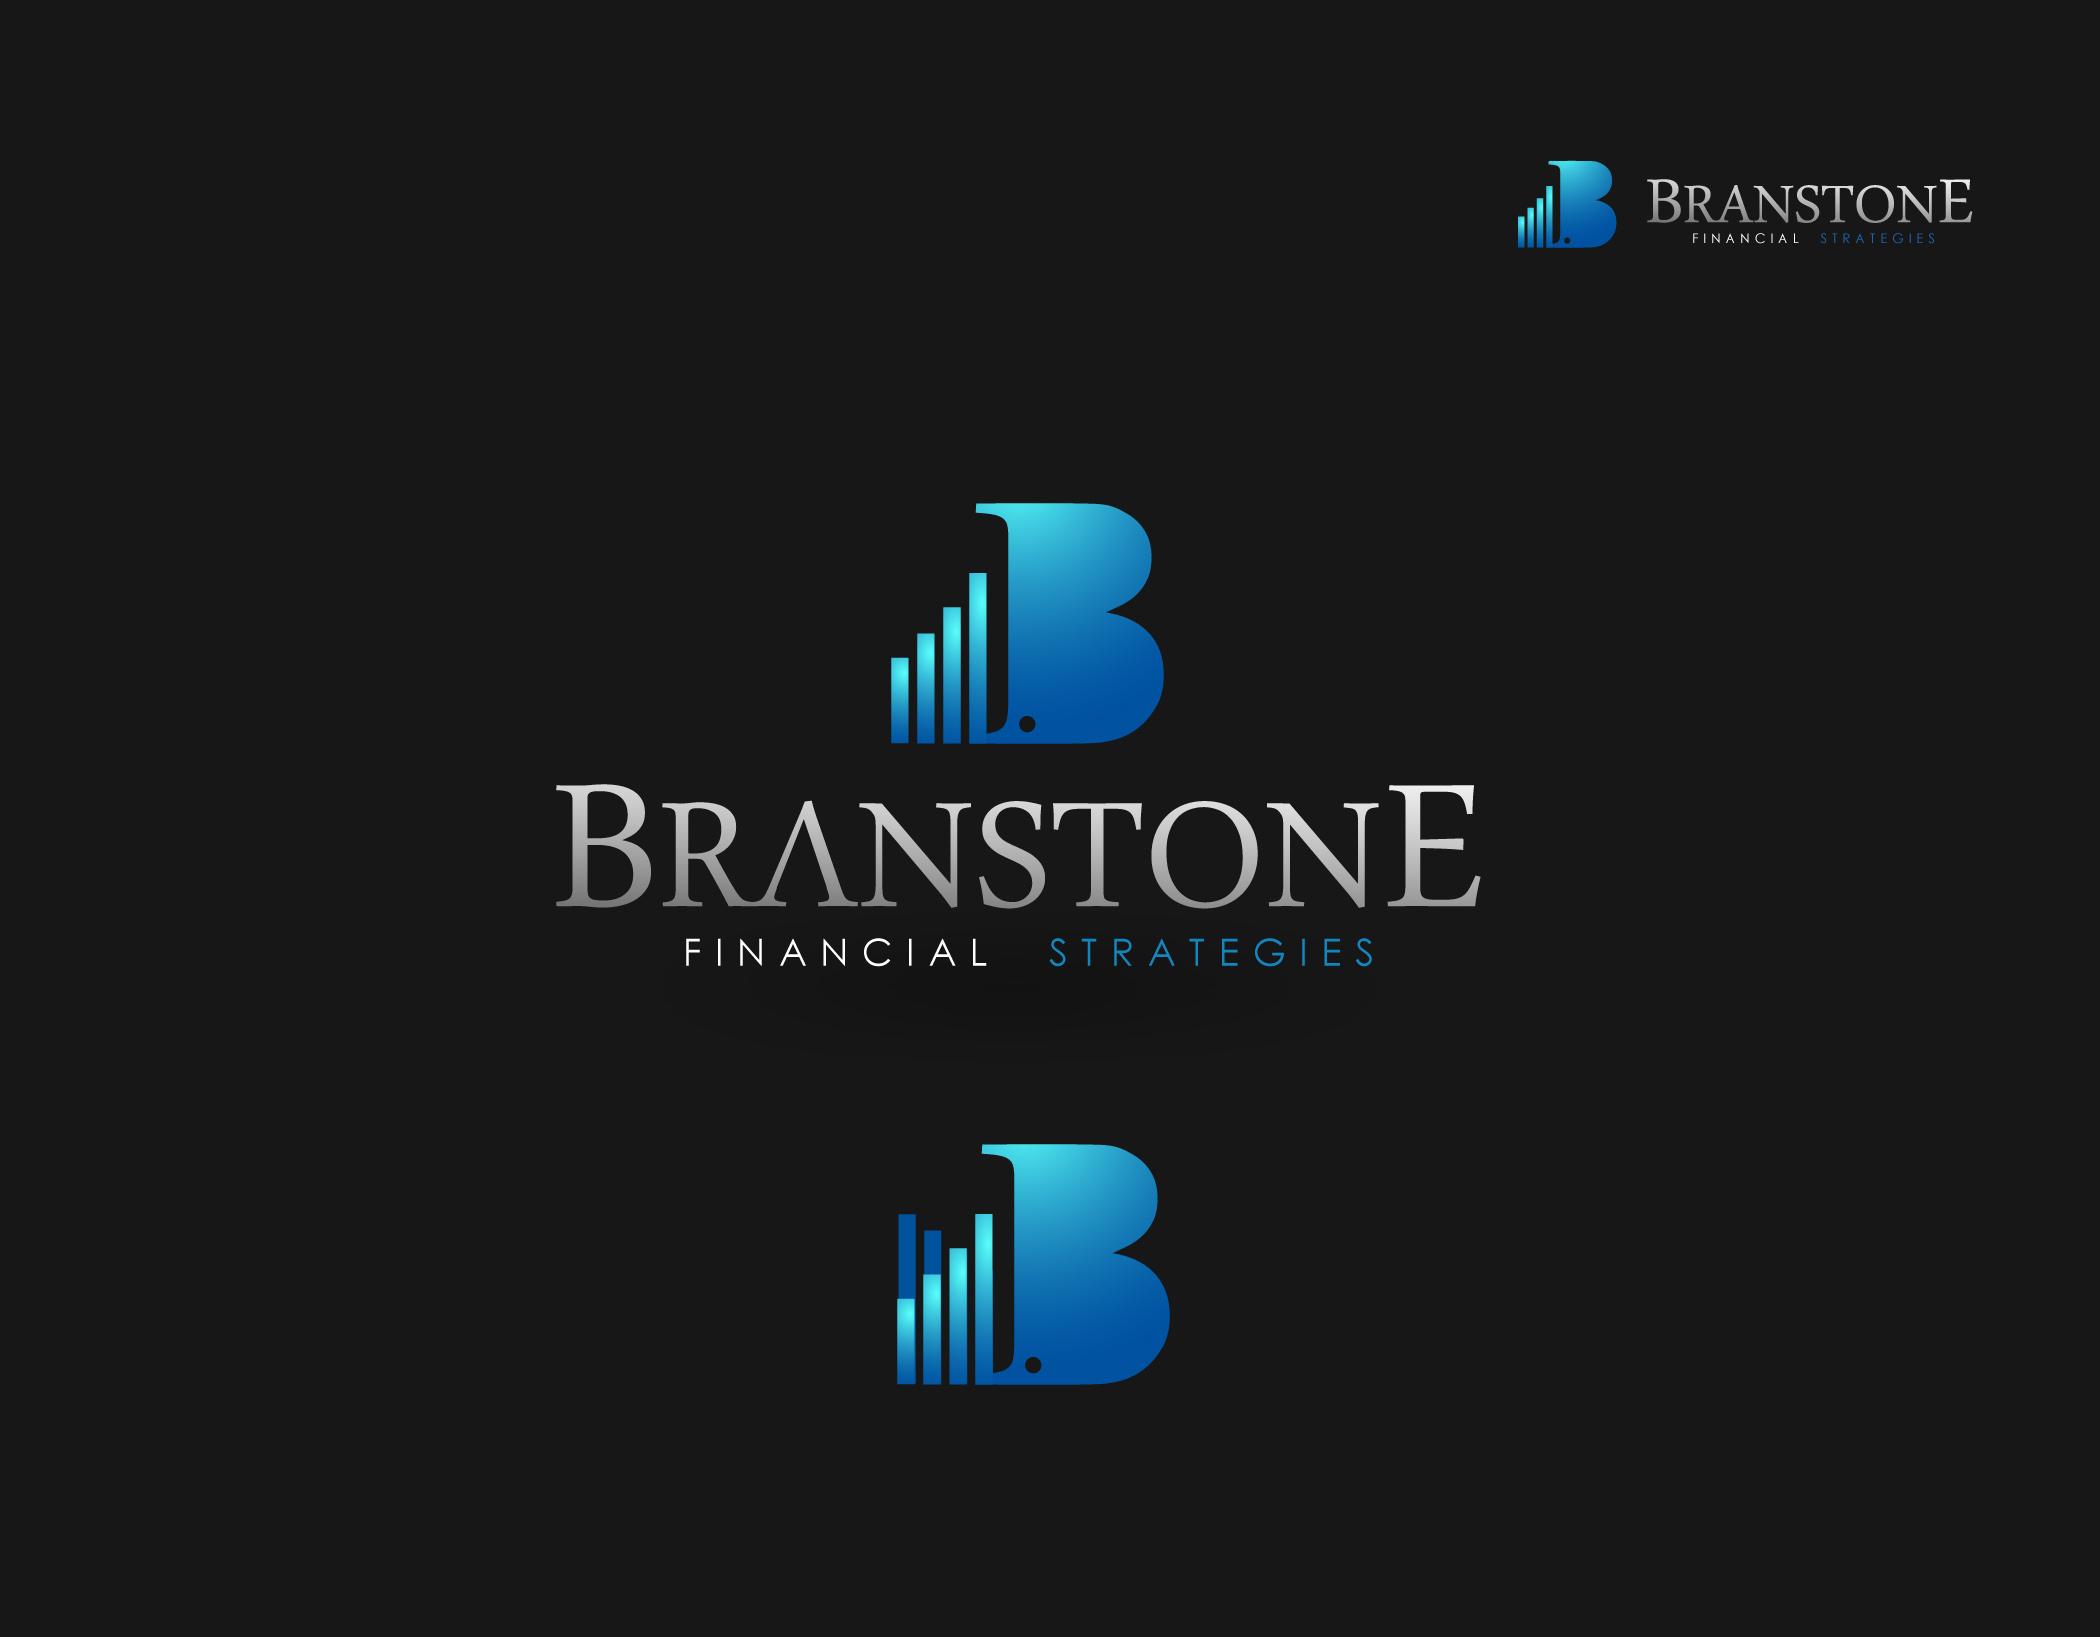 Logo Design by Mark Anthony Moreto Jordan - Entry No. 275 in the Logo Design Contest Inspiring Logo Design for Branstone Financial Strategies.